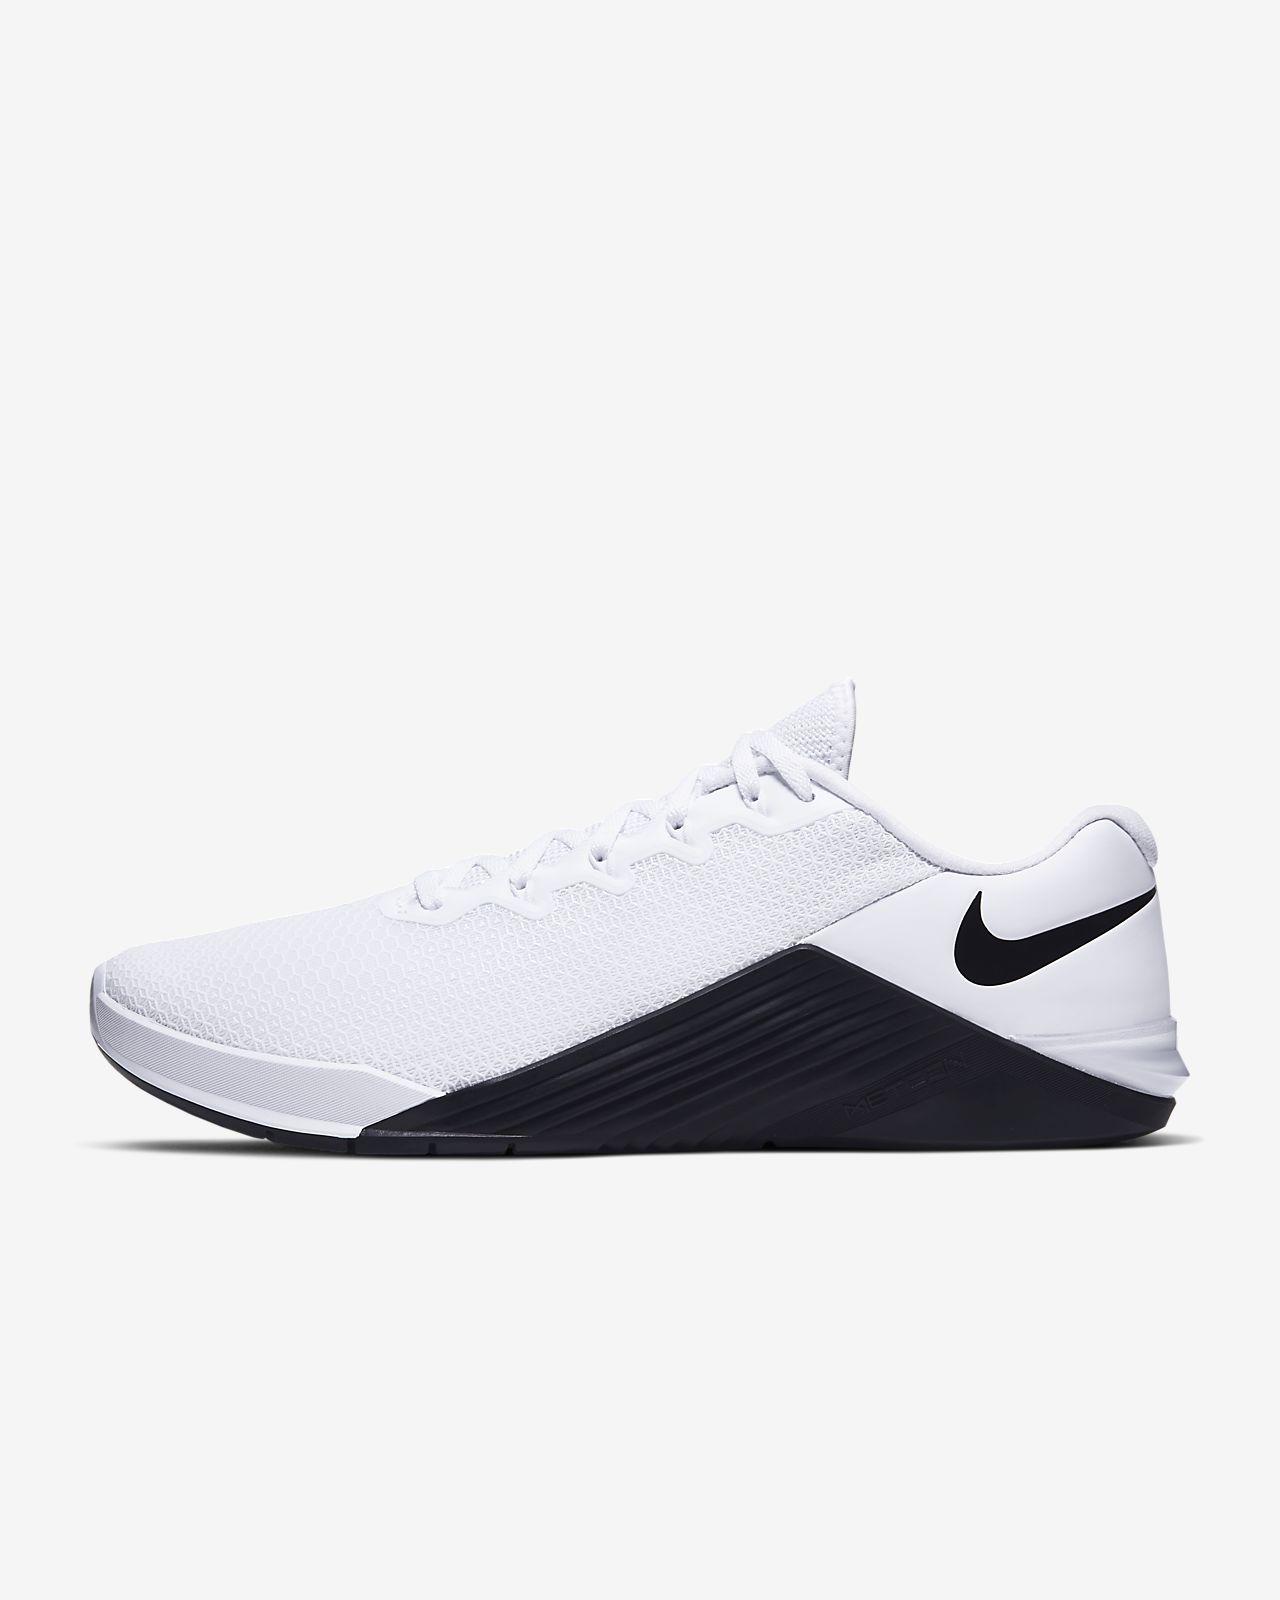 Nike Metcon 5 treningssko